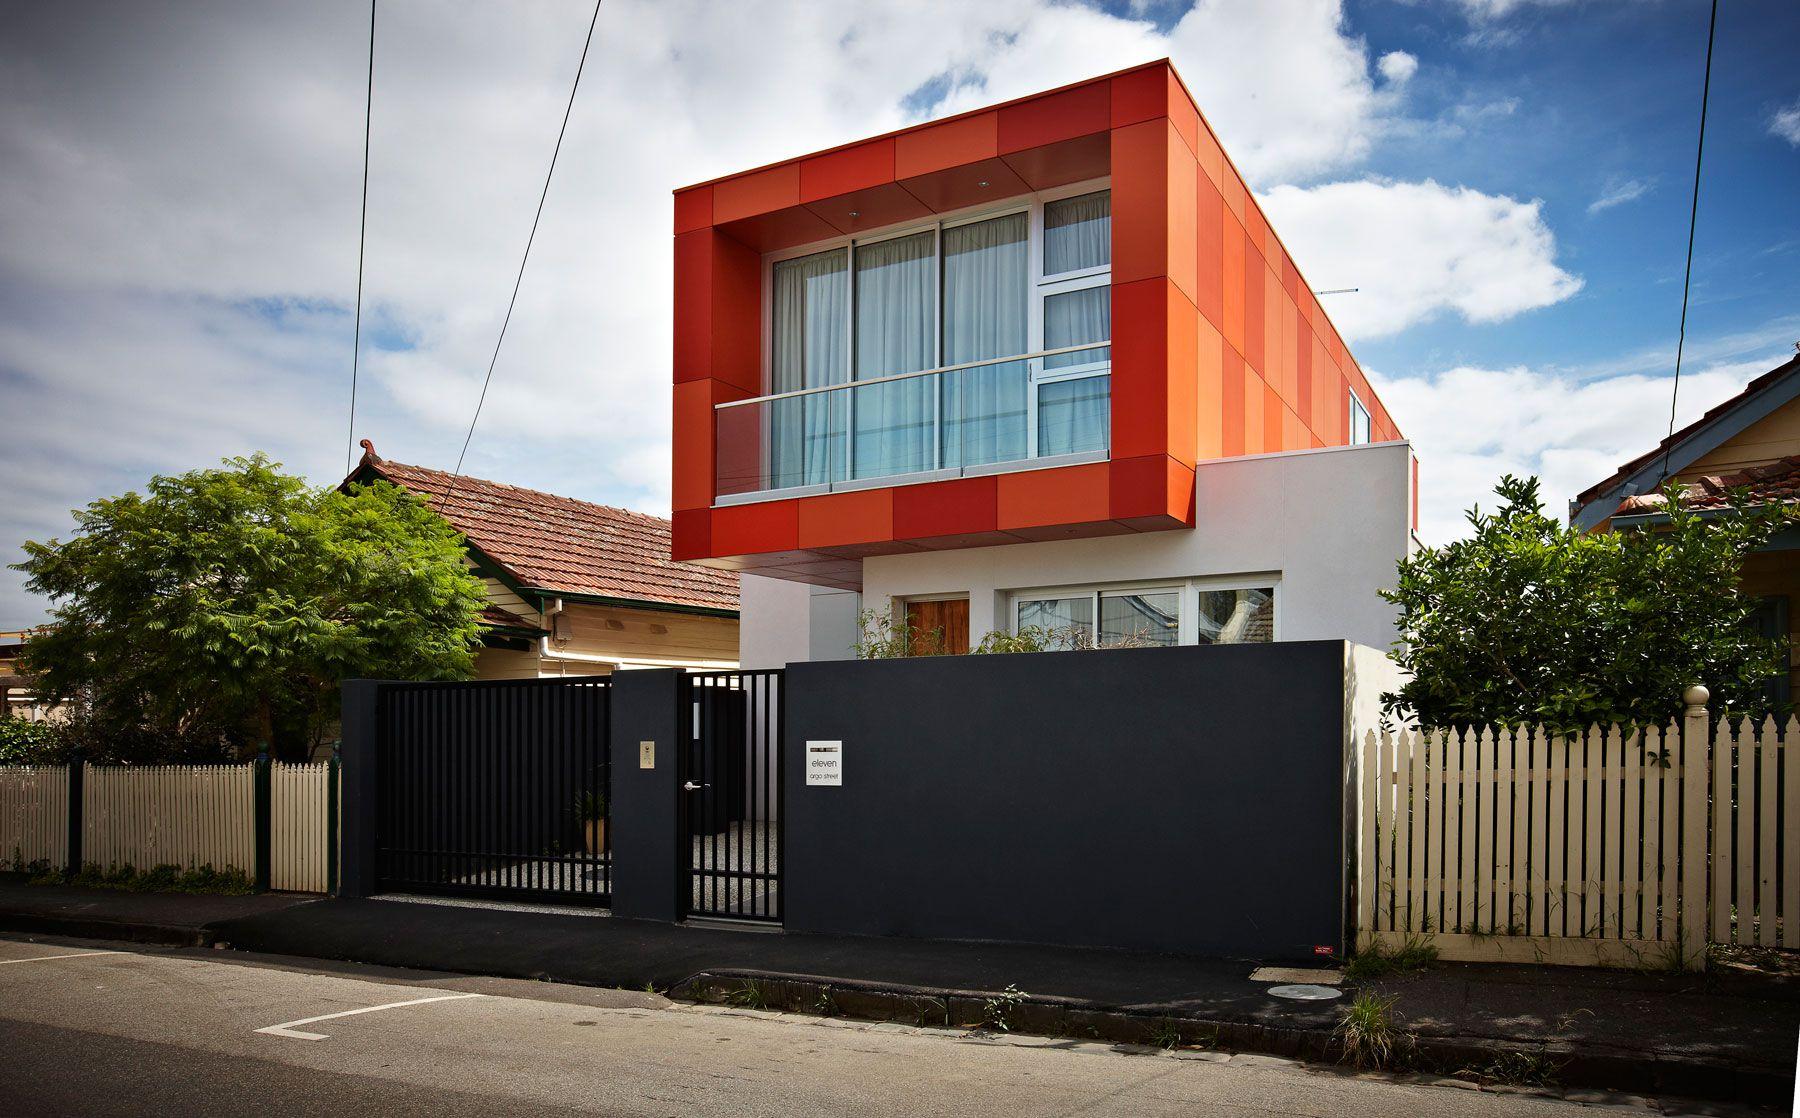 Dise o de casa moderna de dos plantas planos construye for Colores para frentes de casas modernas